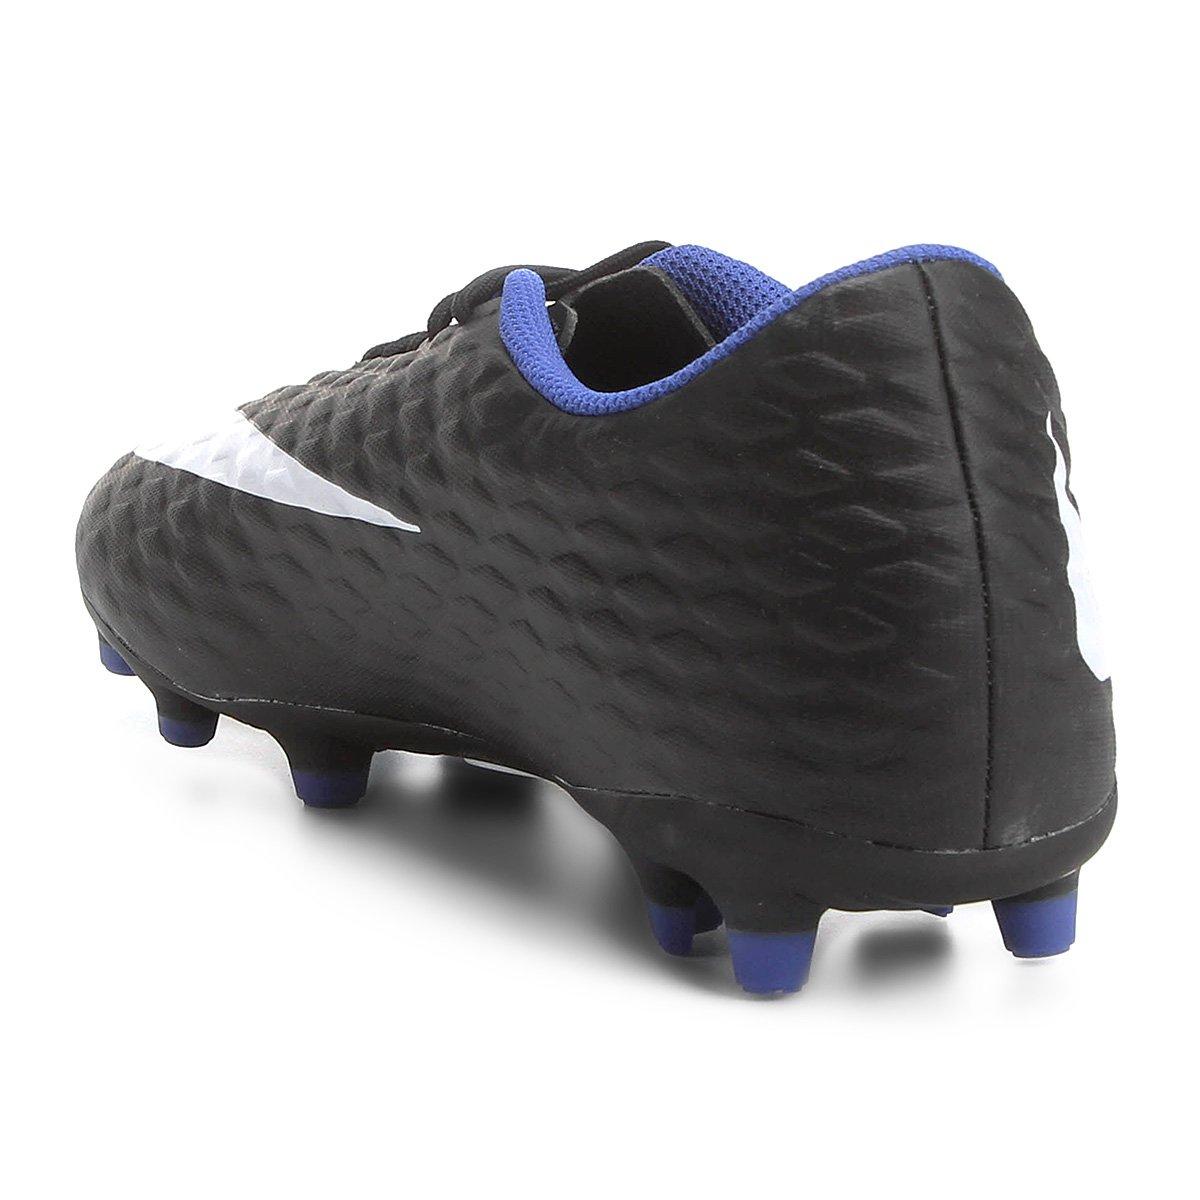 05331bf94c Chuteira Campo Nike Hypervenom Phade 3 FG - Tam  38 - Shopping TudoAzul